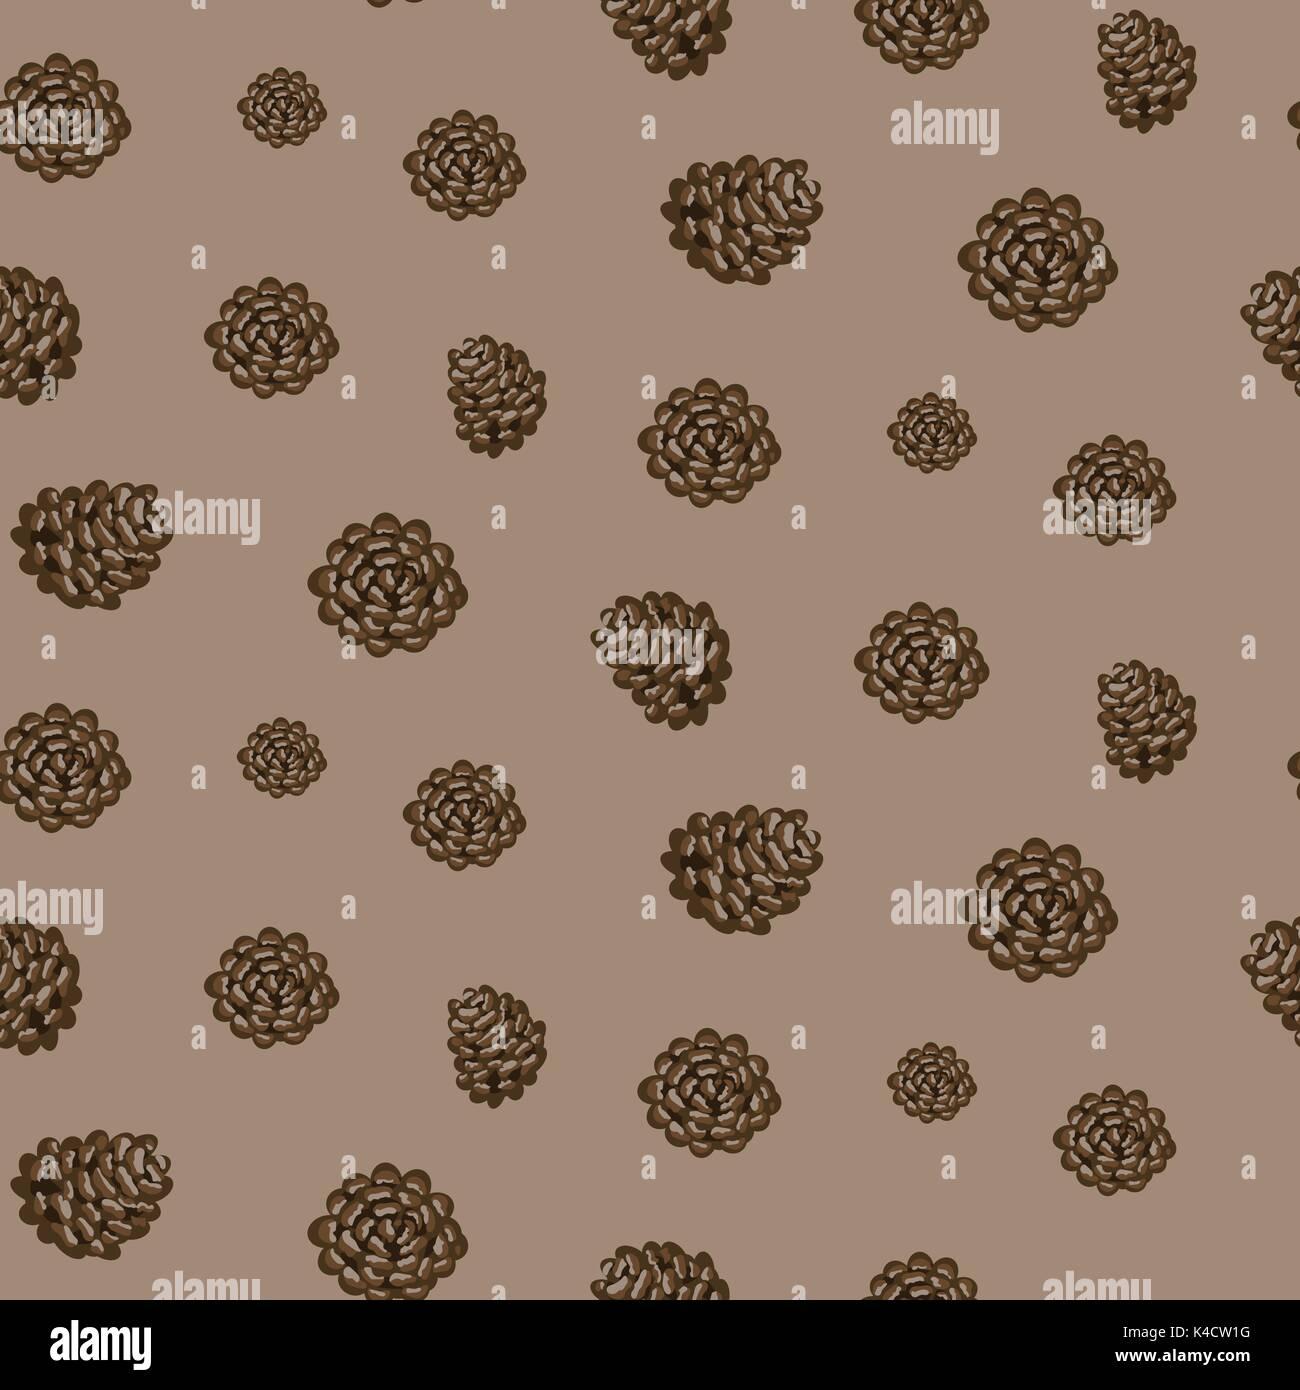 Fir cones seamless vector brown background pattern. - Stock Vector